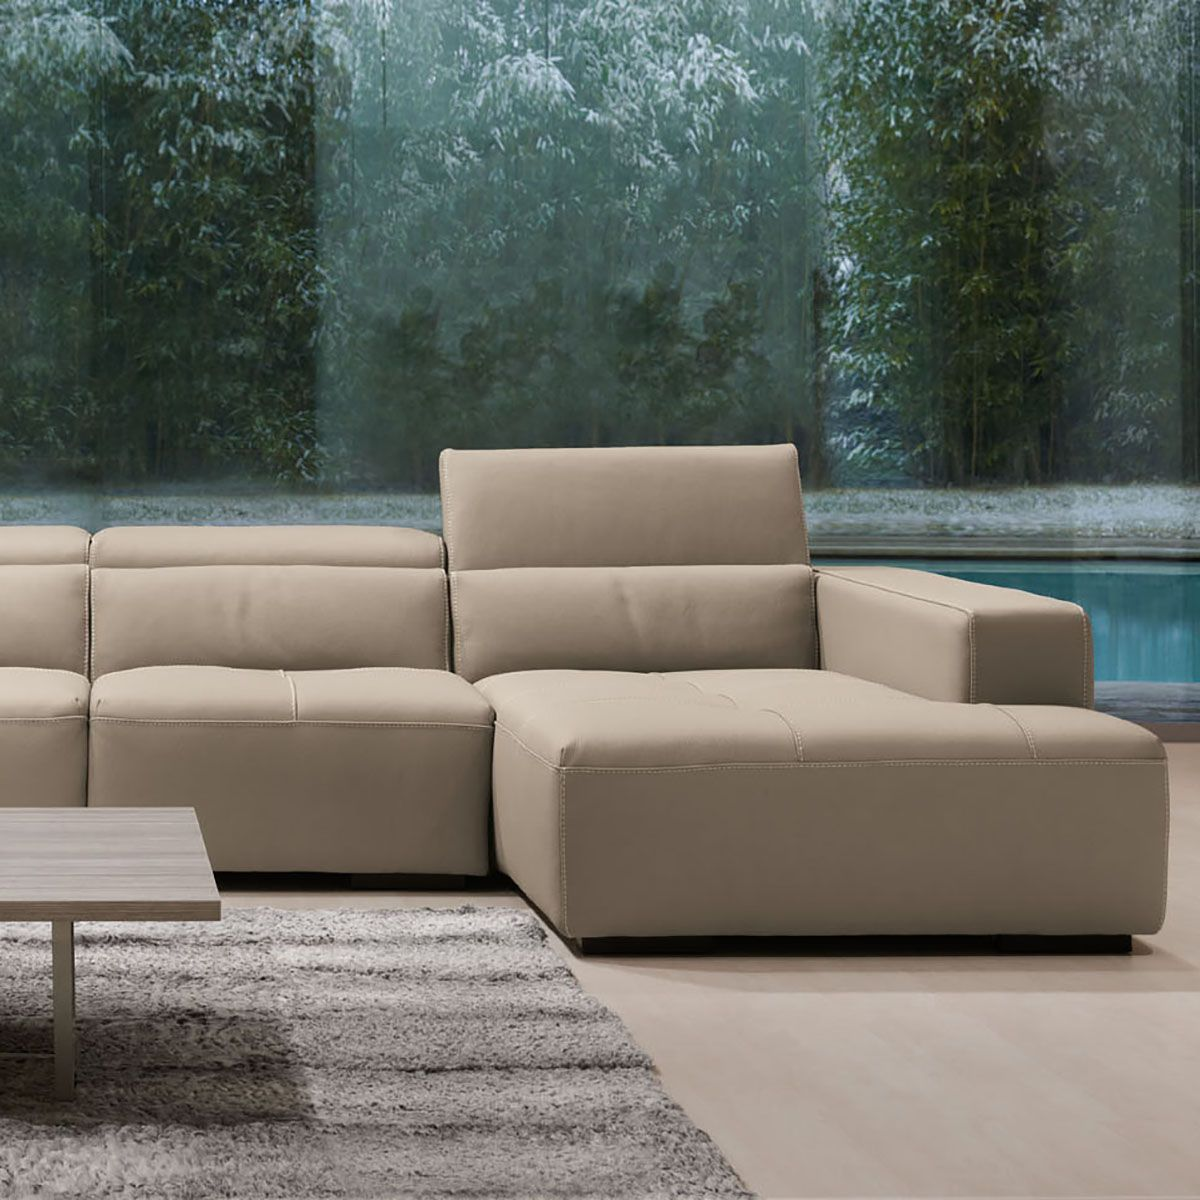 Leather Furniture Stores In Miami Fl